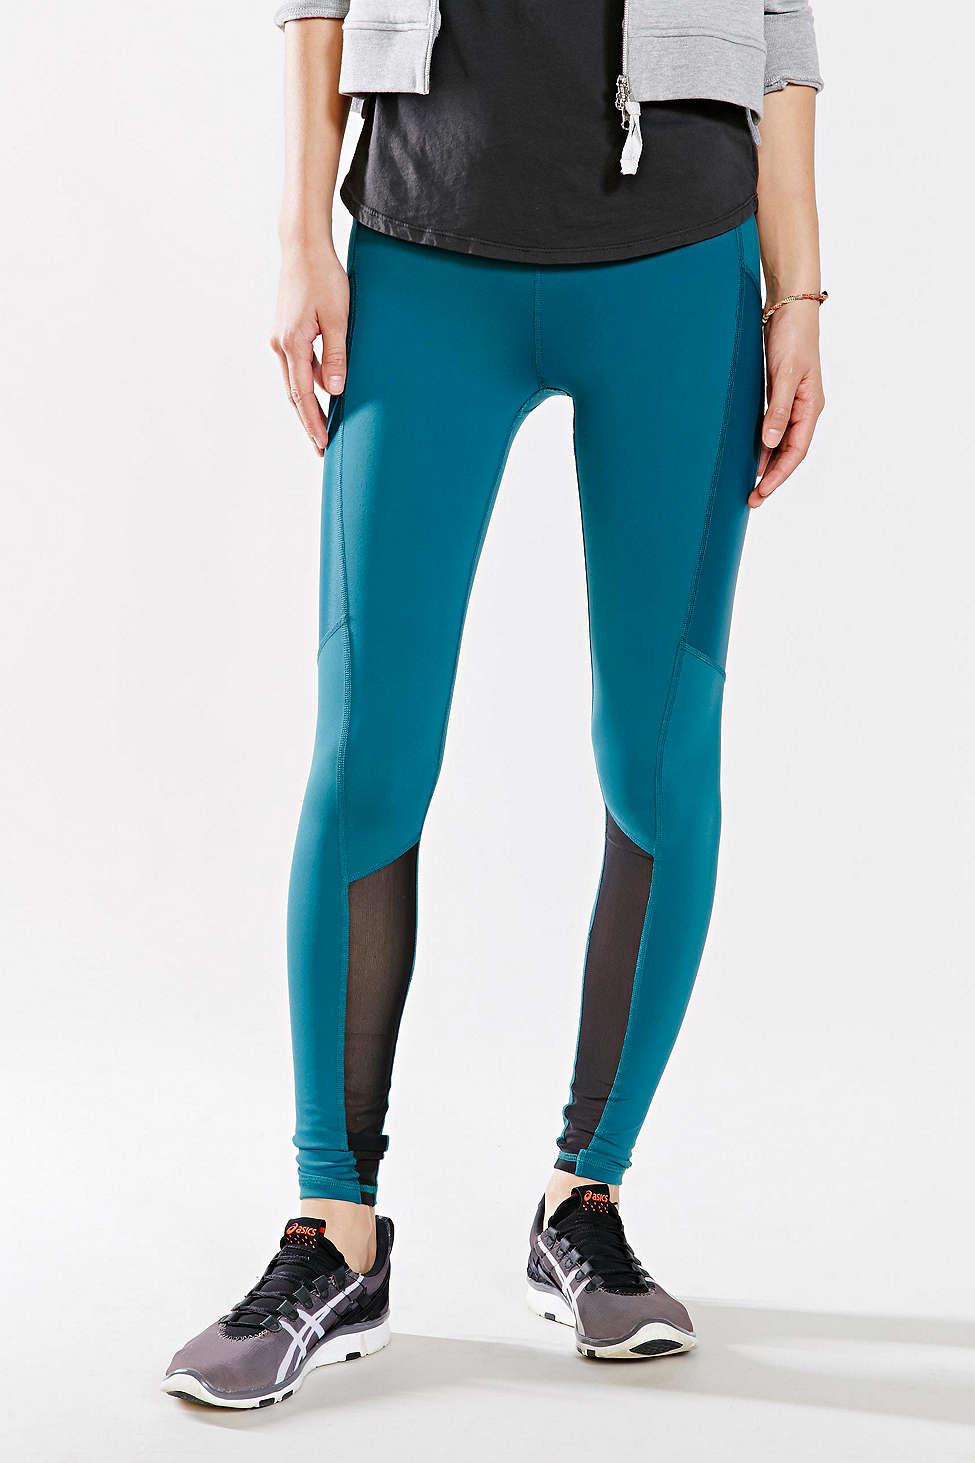 Alo Yoga Swift Legging